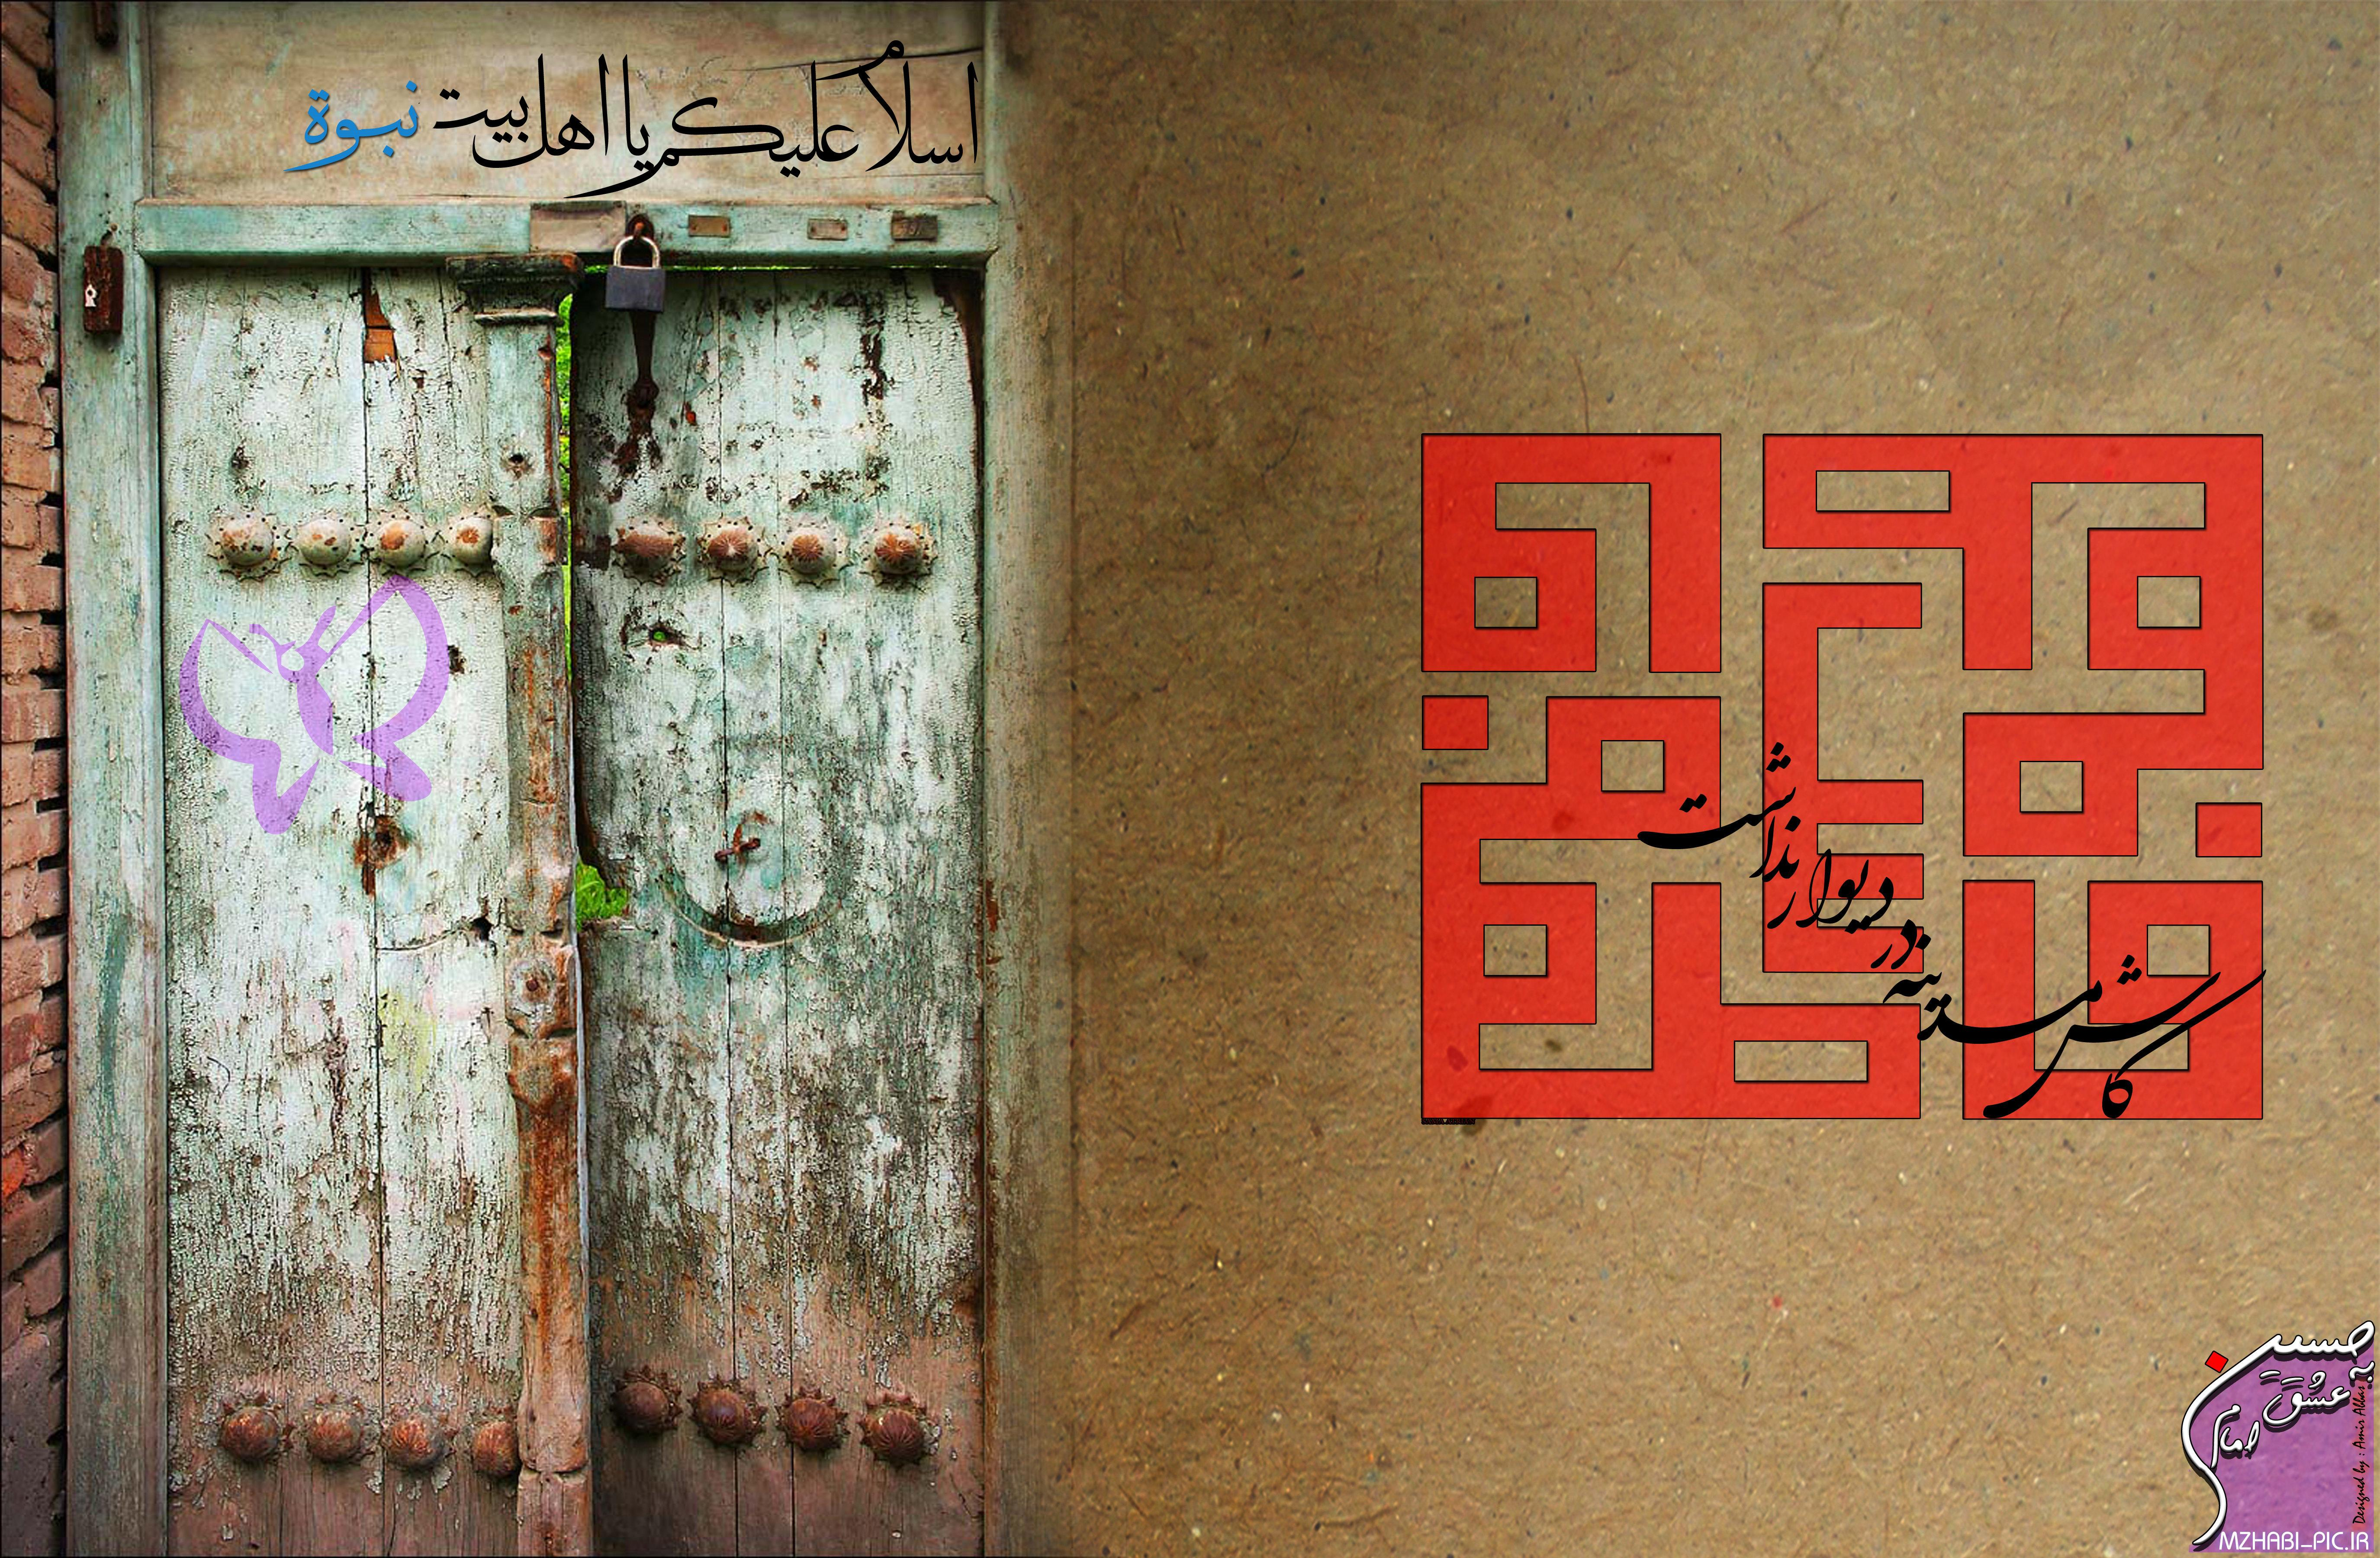 http://omarsetiz.persiangig.com/image/hazratzahra/new_folder/10.JPG